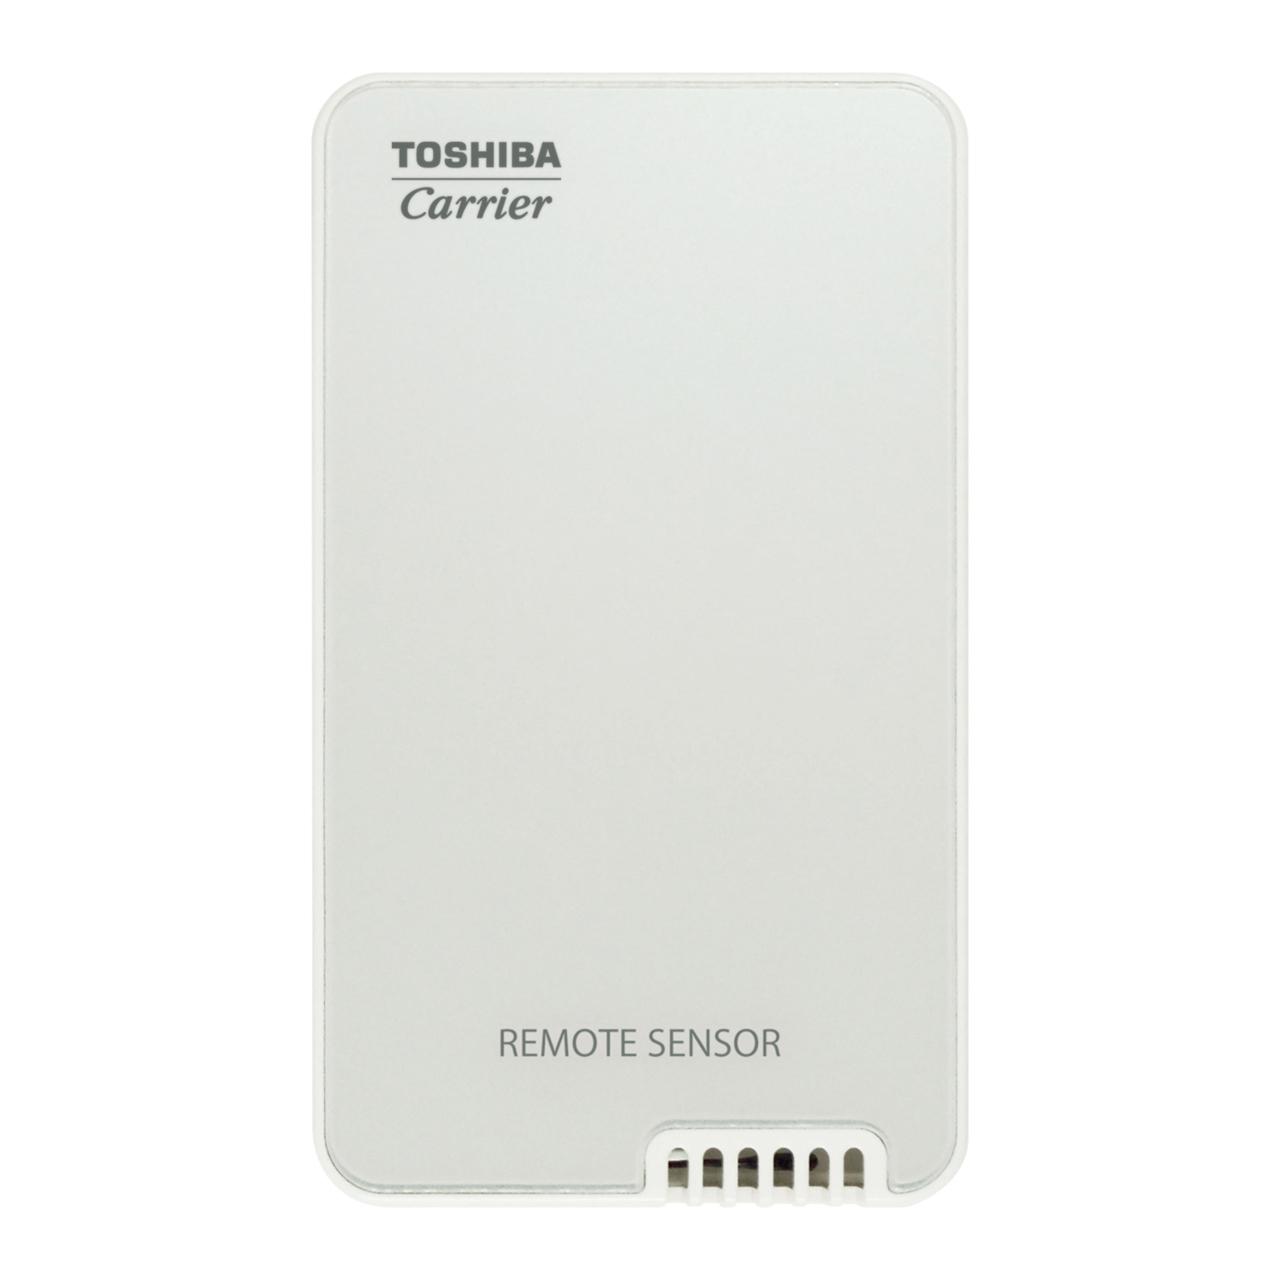 carrier-TCB-TC41LUL-vrf-remote-sensor